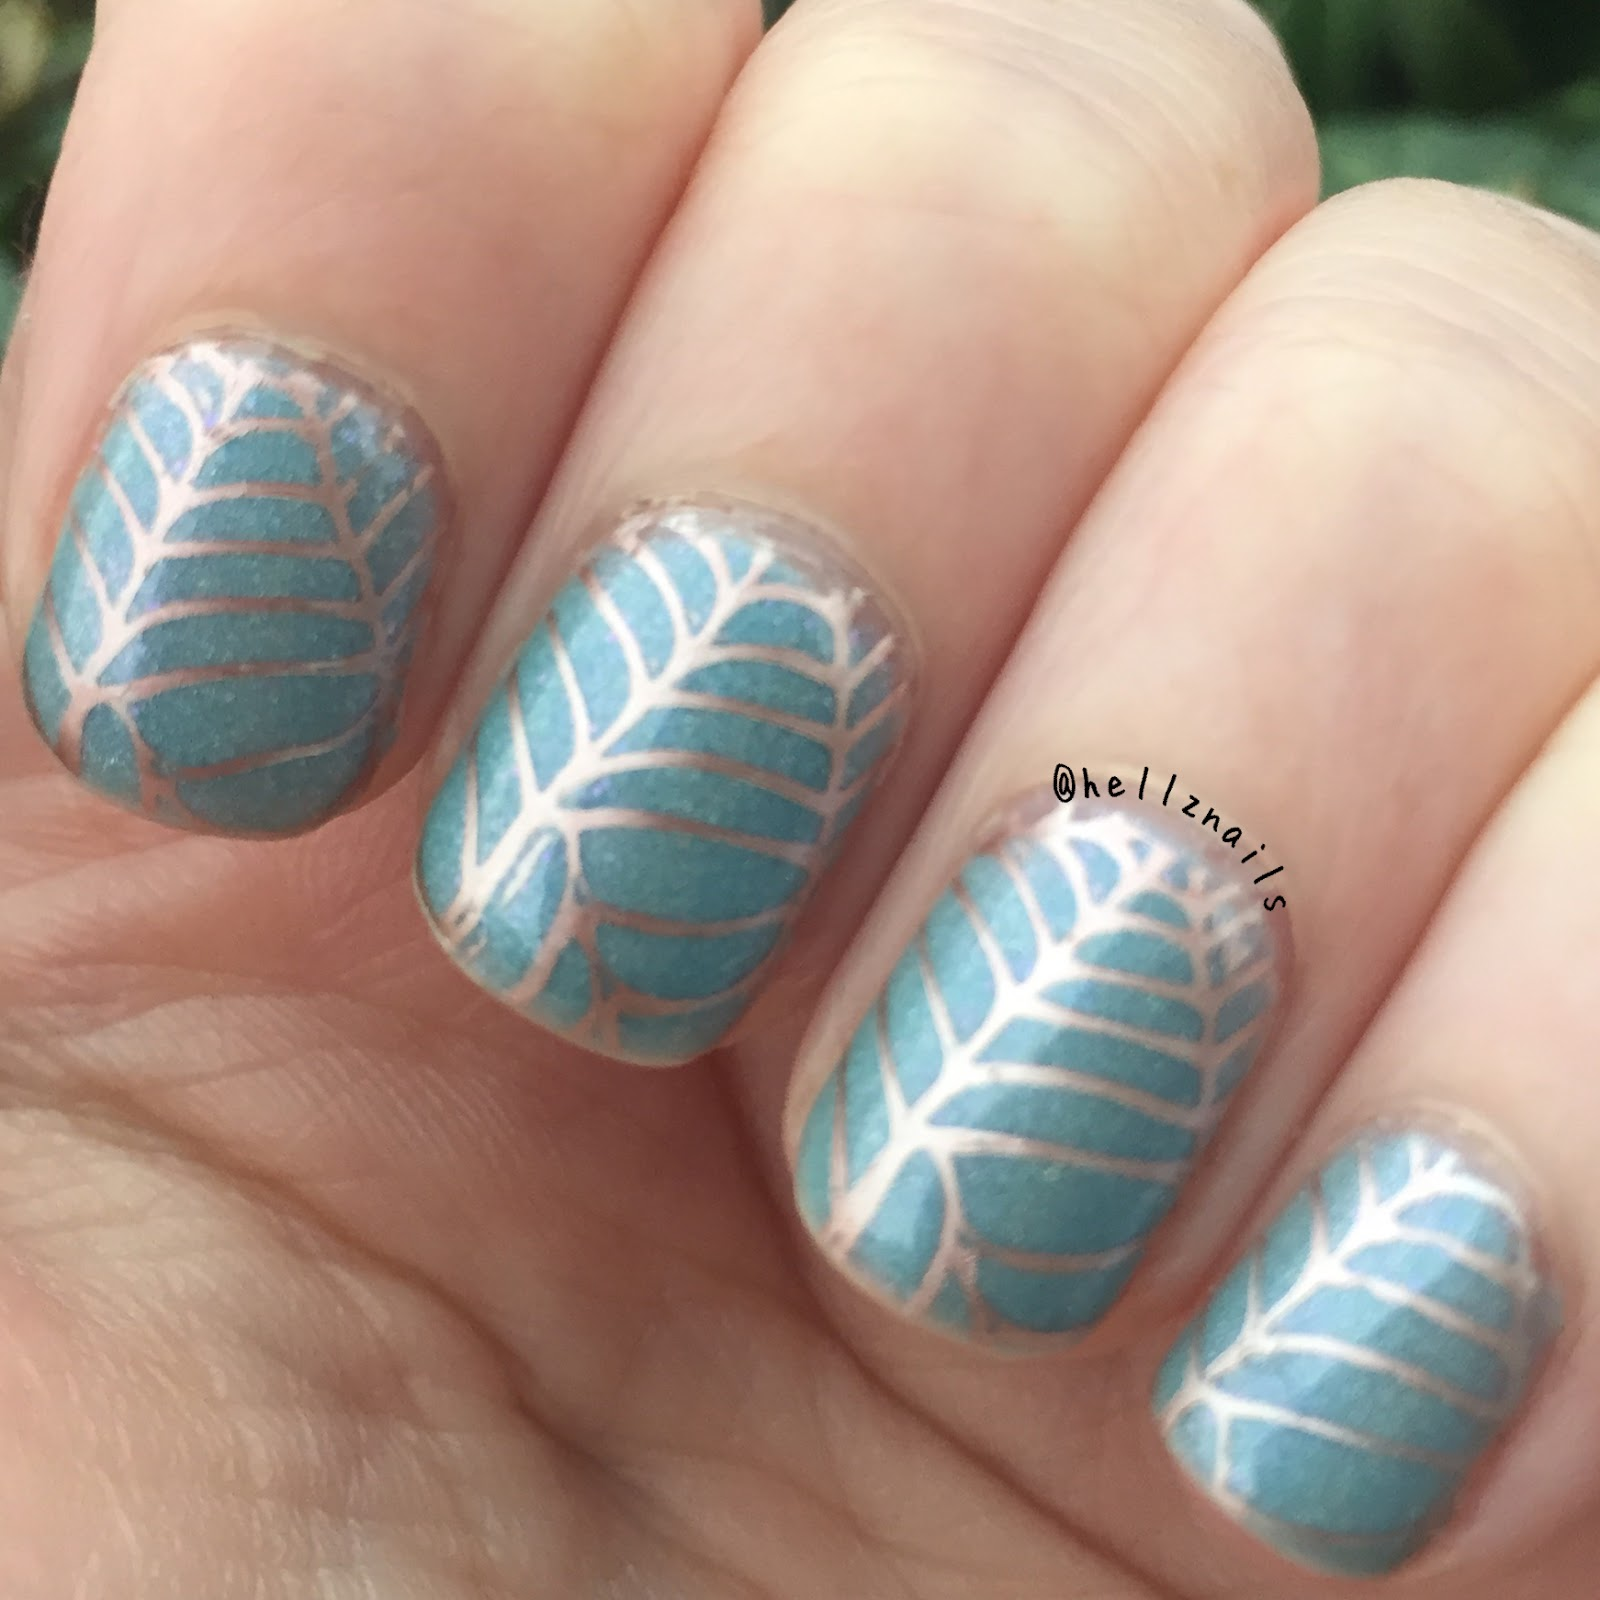 Subtle Spring stamping nail art - Hellz nails